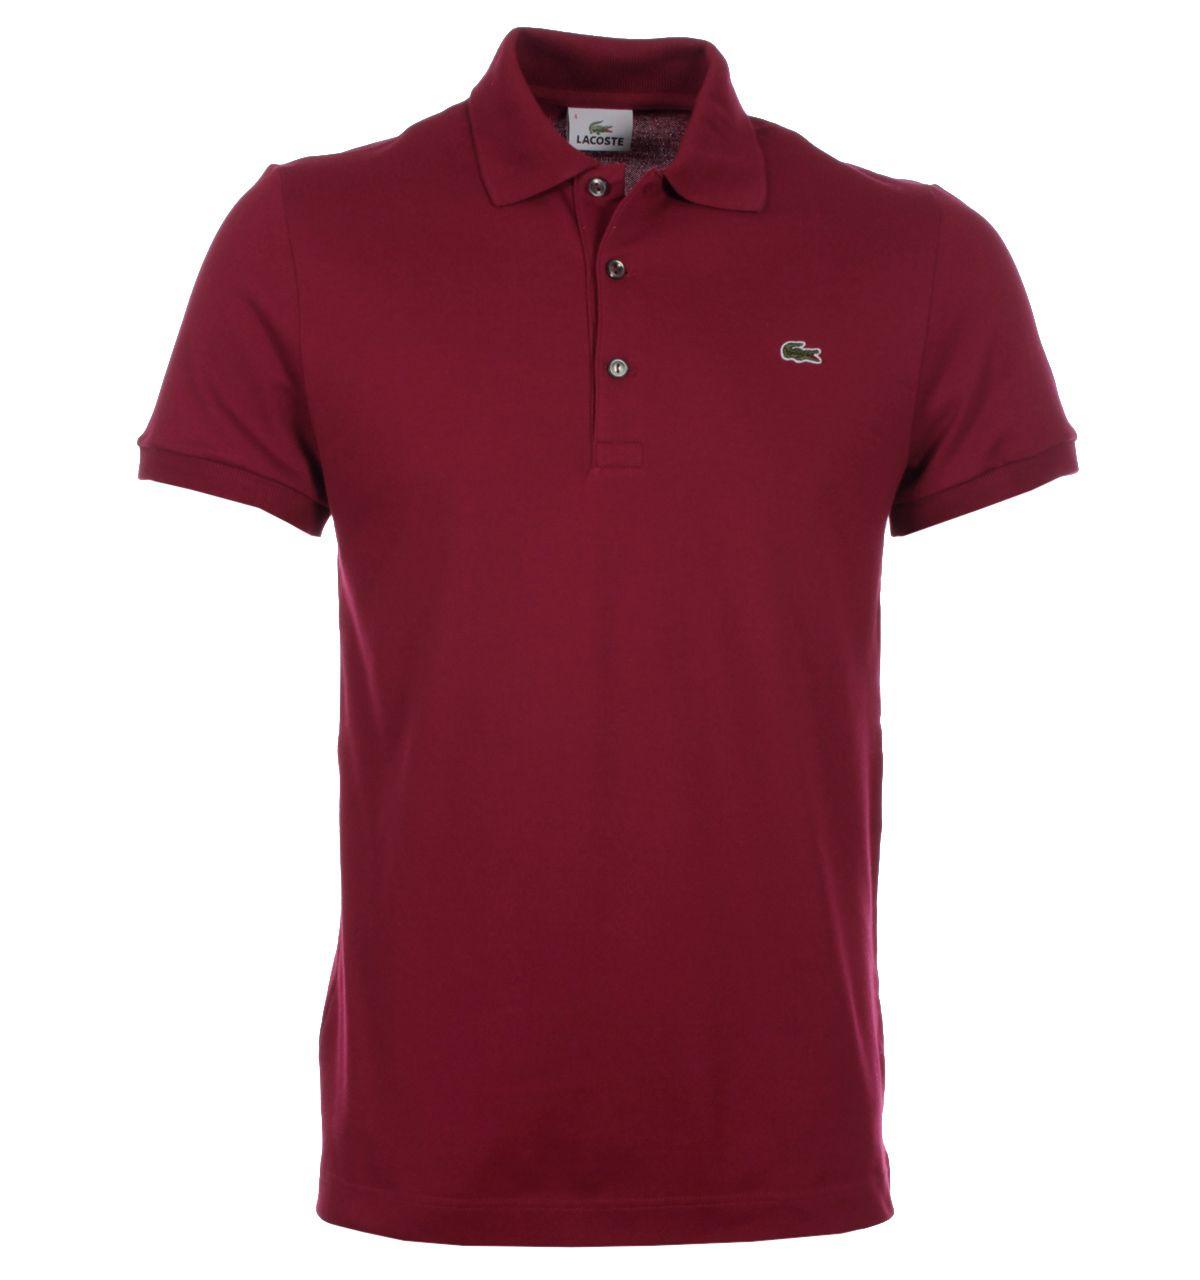 19132b6467 Lacoste Polo Shirts. Lacoste Bordeaux Red Mini Pique Stretch Polo Shirt